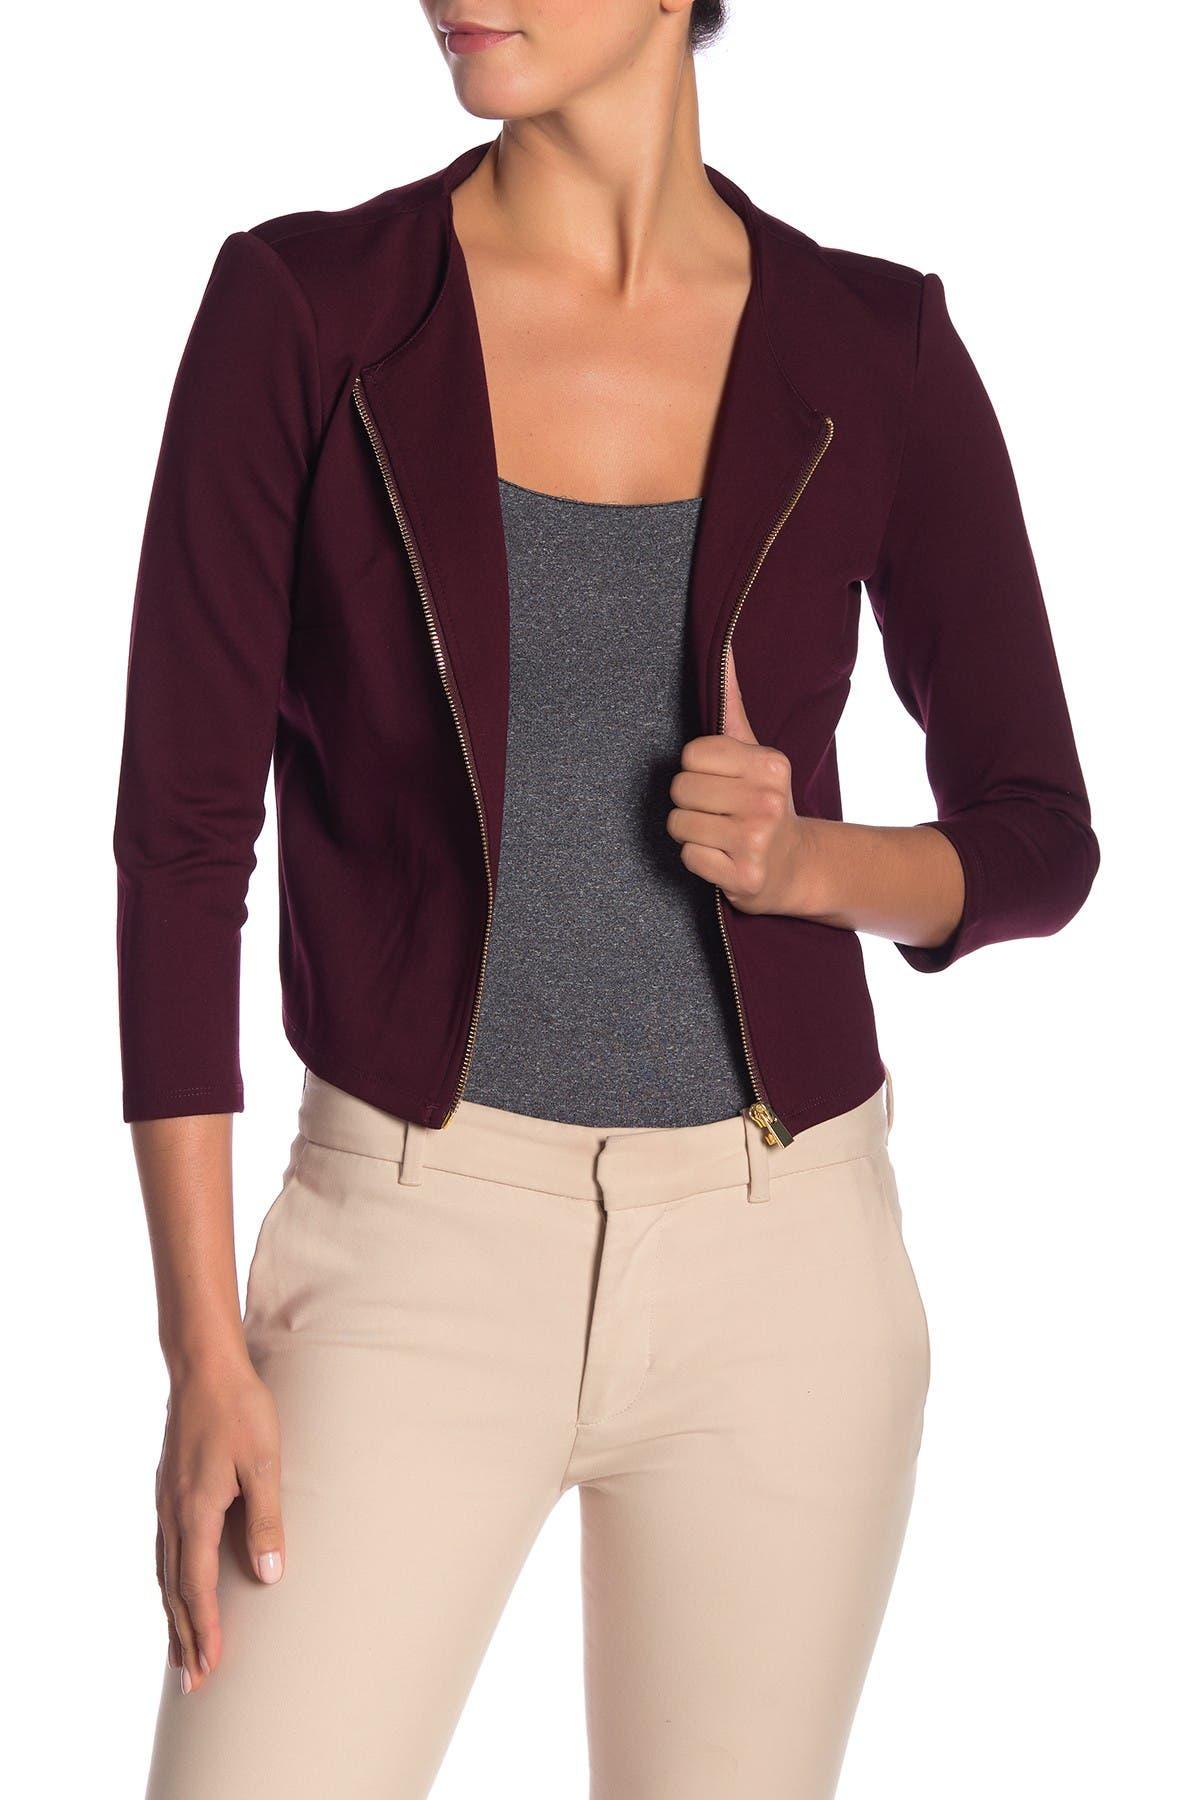 Image of Philosophy Apparel Ponte Zip Front Jacket